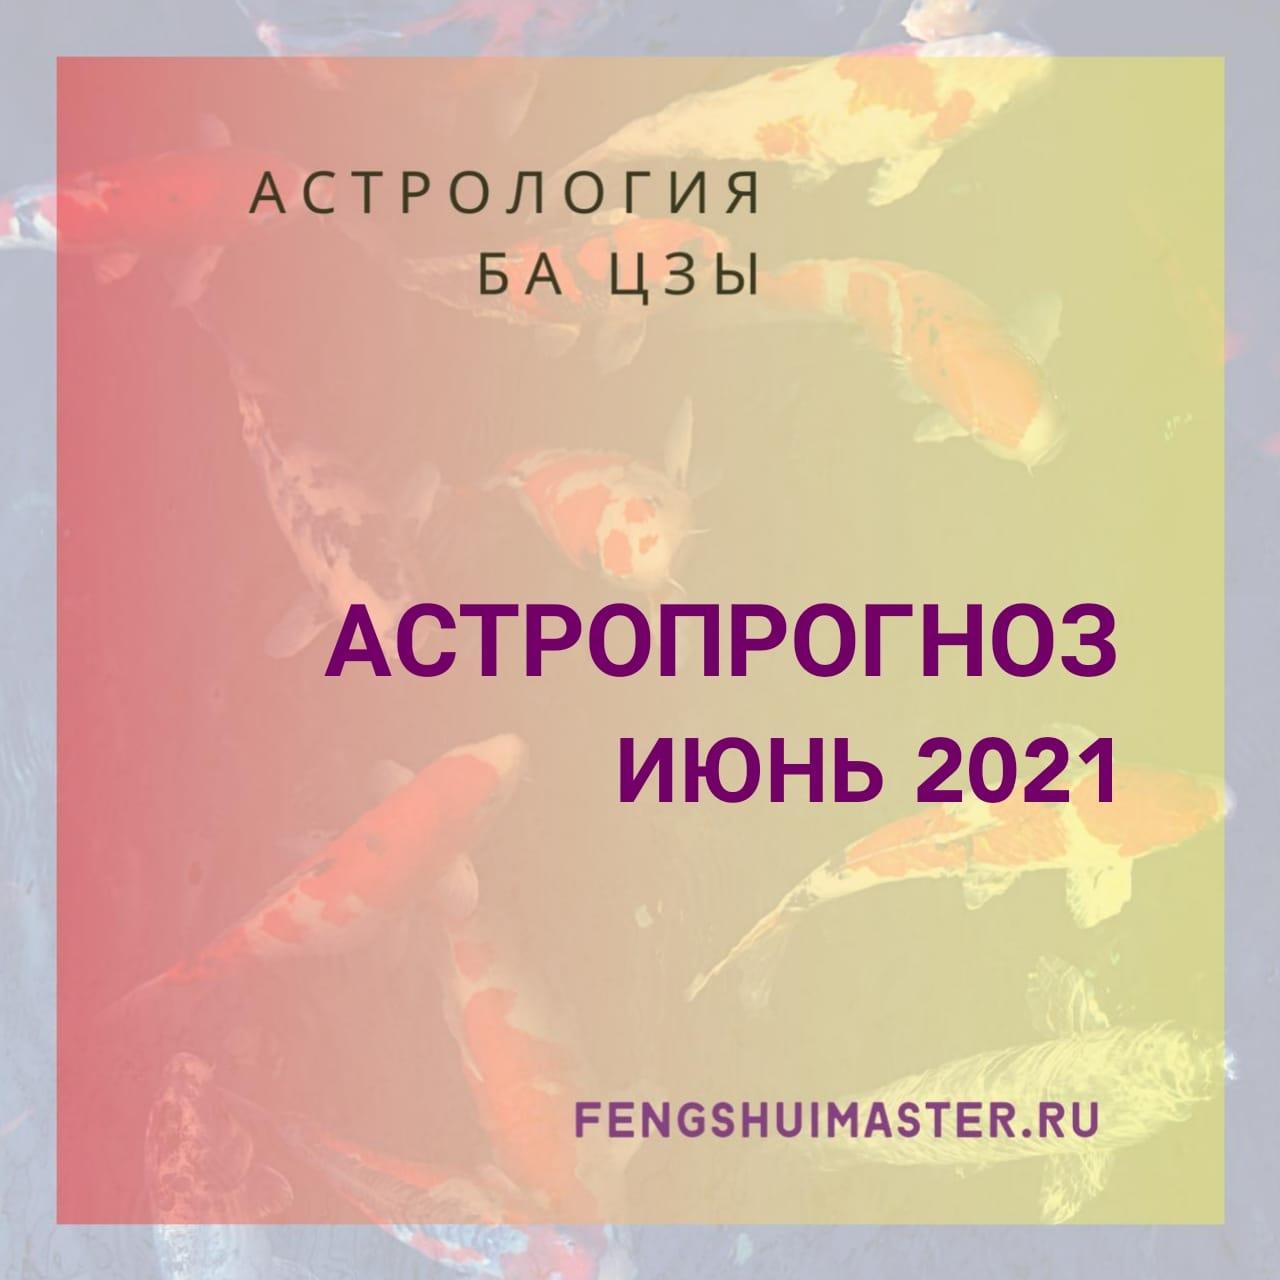 Астропрогноз - июнь 2021 - Fengshuimaster.Ru